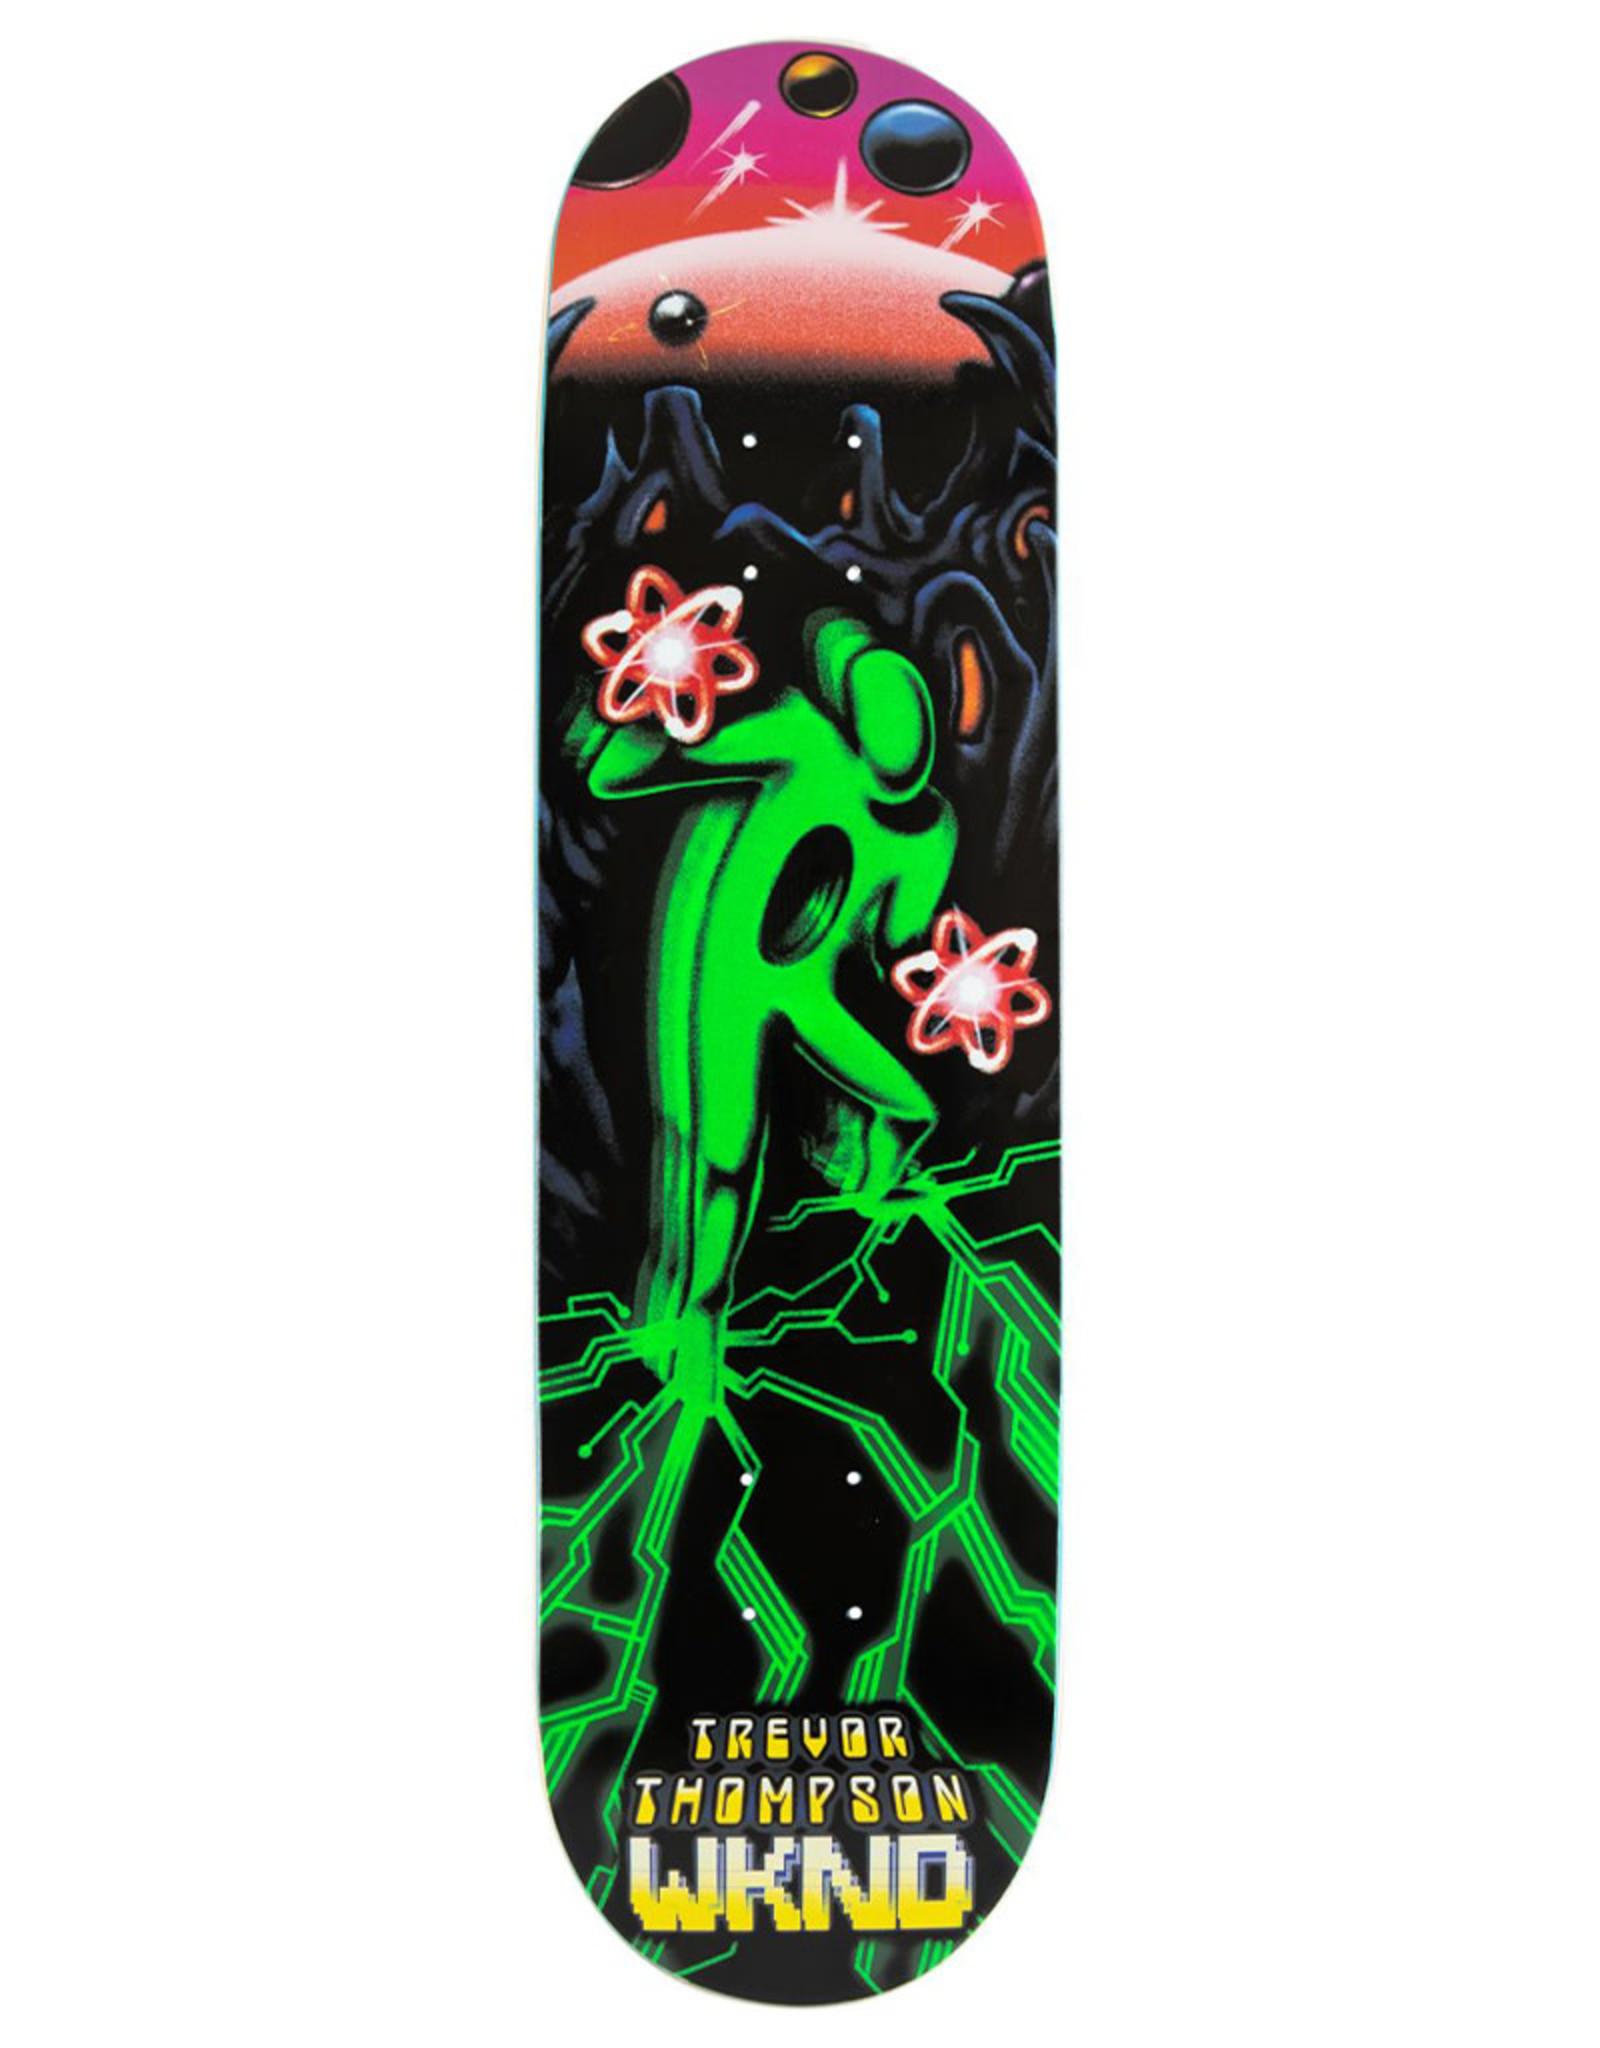 Wknd Skateboards Wknd Deck Trevor Thompson Collider (8.25)